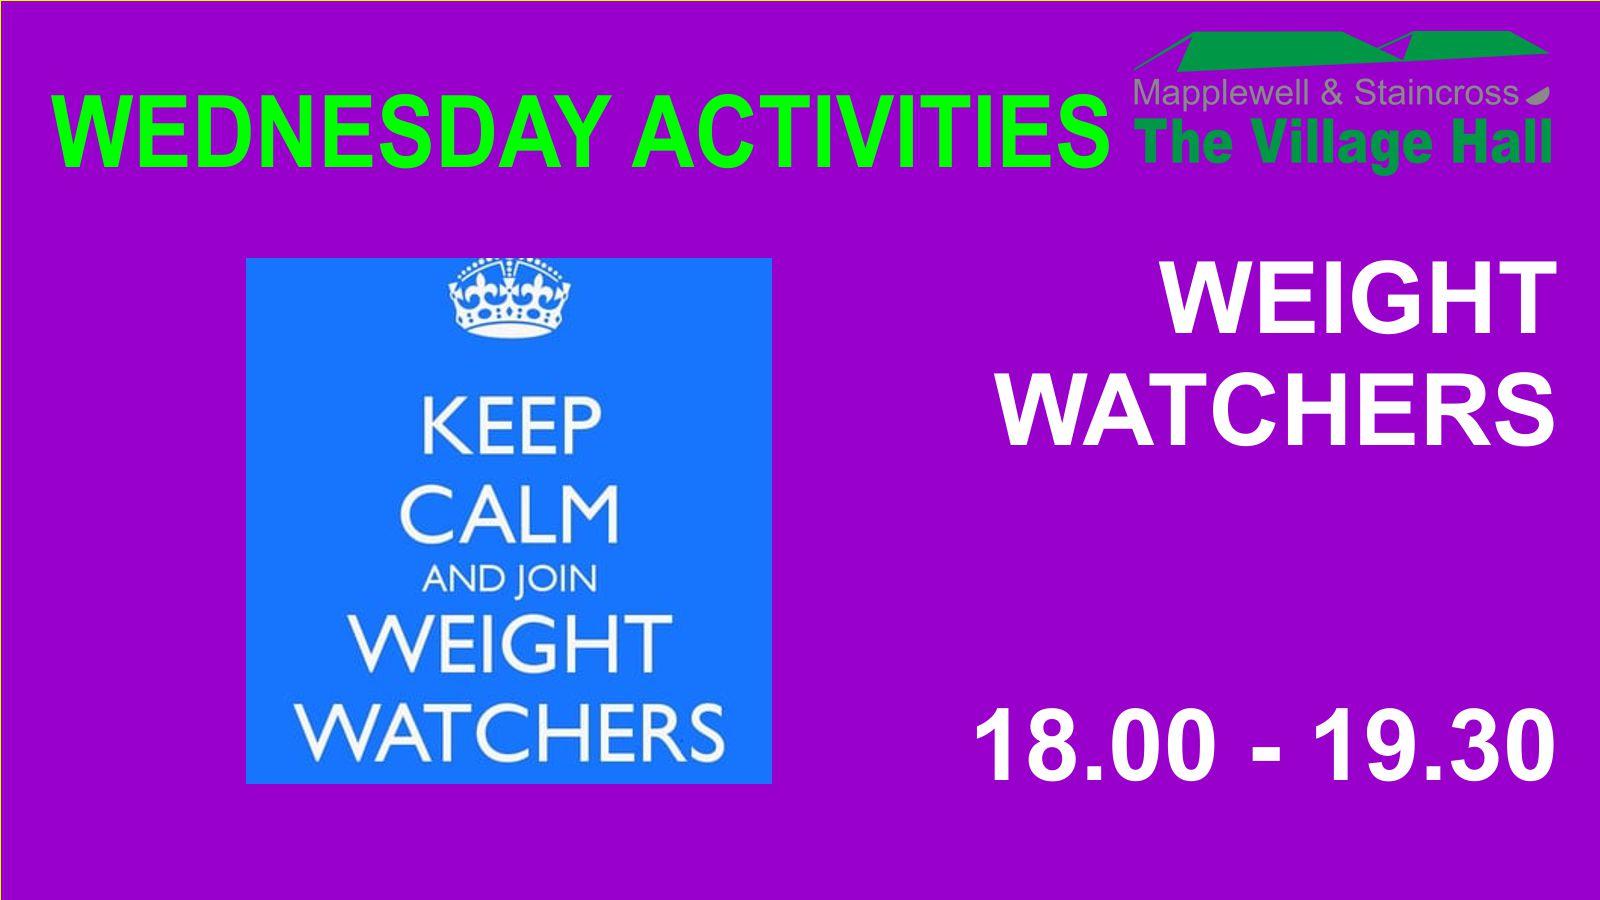 (C) Nick Hibberd - Weight Watchers